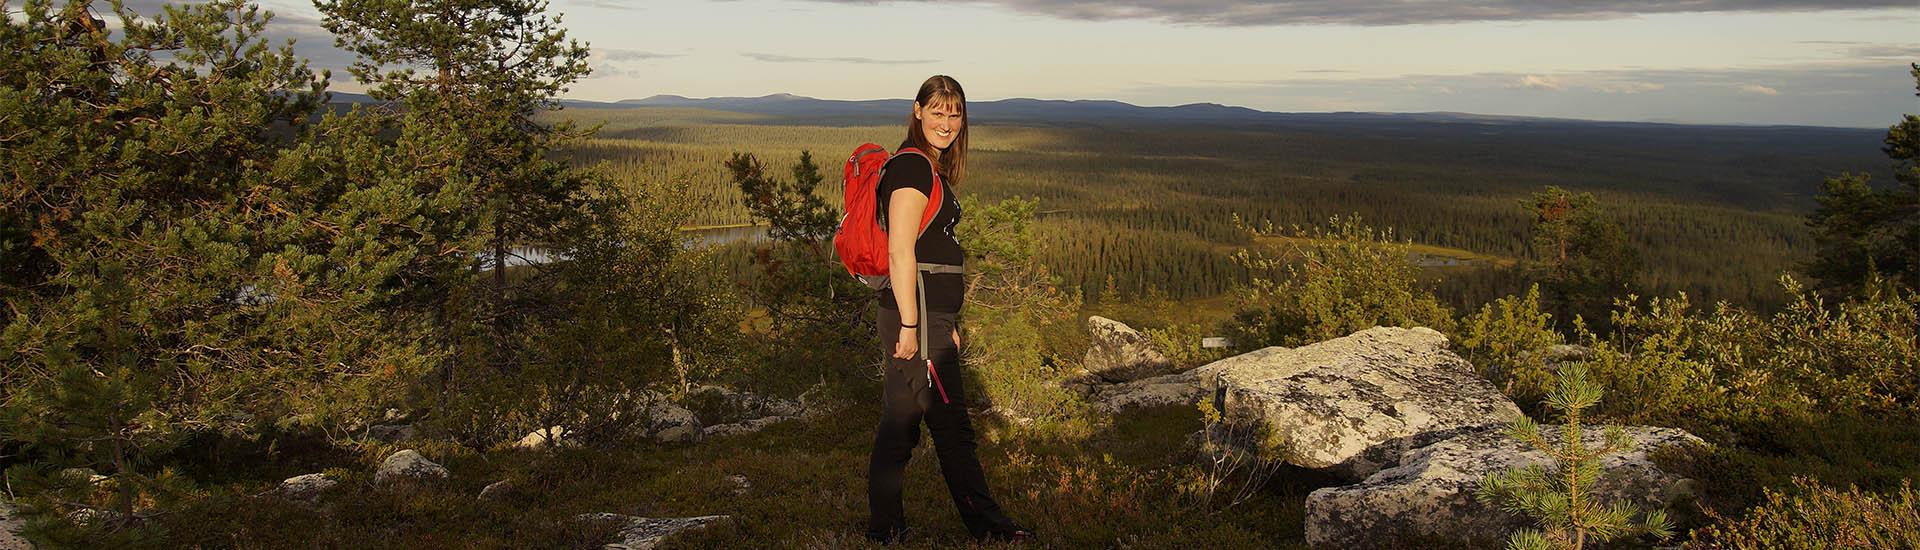 Caroline Vlietstra Salla Fins Lapland fotograaf Voigt Travel